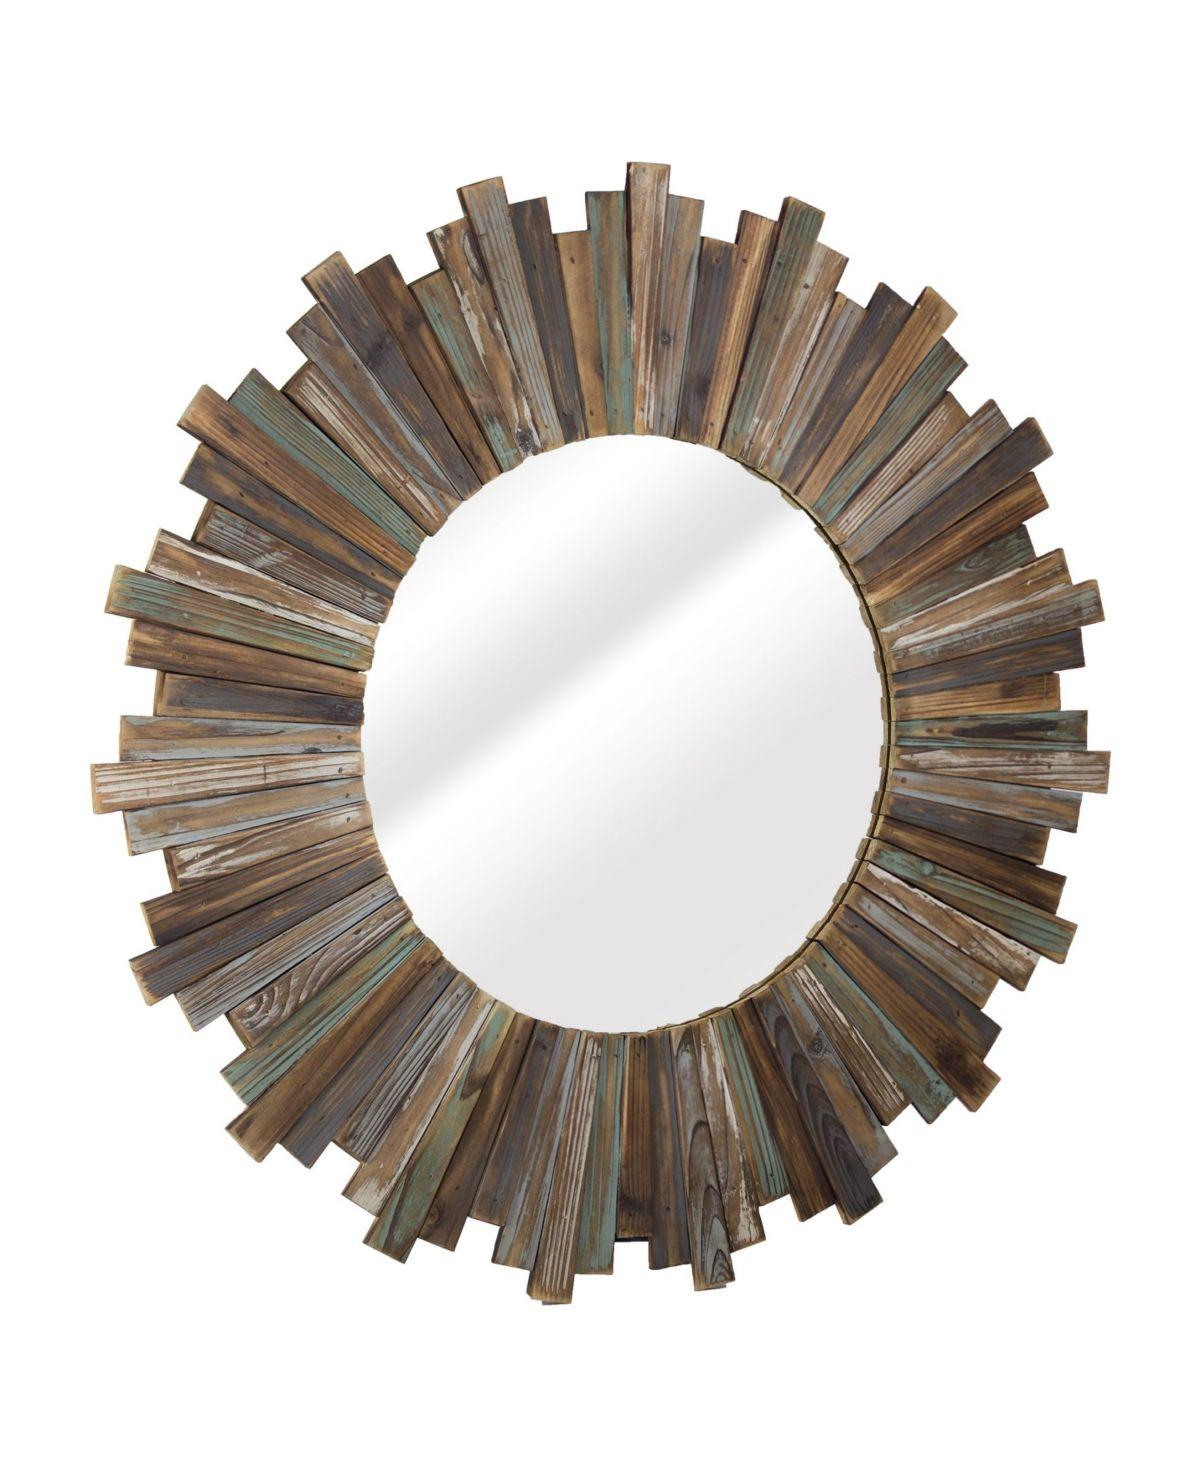 Crystal Art Gallery American Art Decor Rustic Distressed Wood Round Sunburst Mirror Reviews All Mirrors Home Decor Macy S Starburst Mirror Wall Sunburst Mirror How To Distress Wood